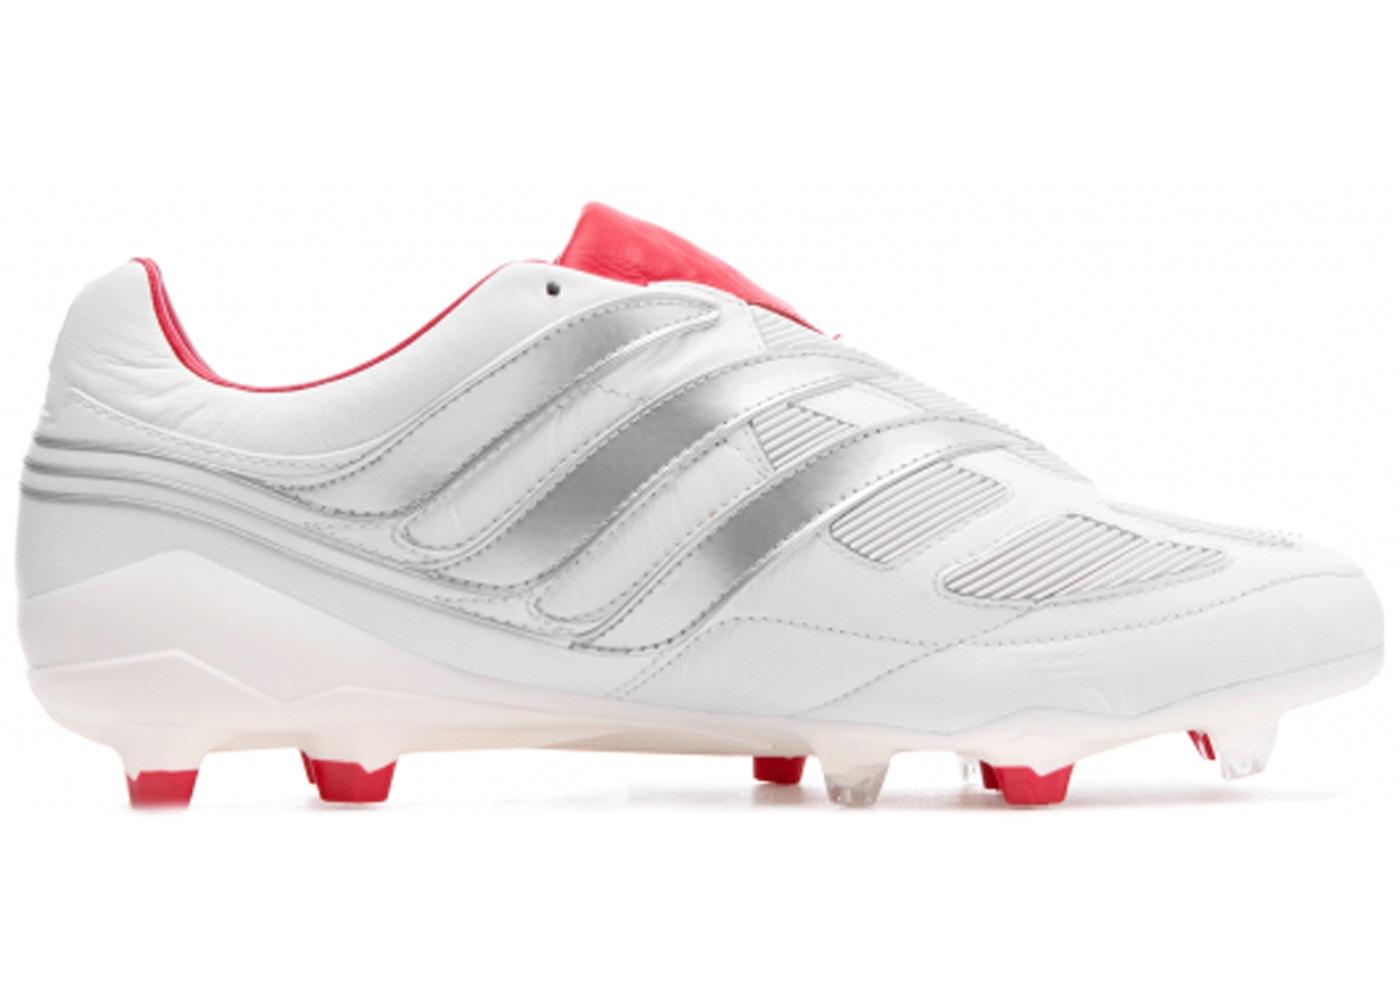 25 Year Adidas David Pack Precision Fg Beckham Predator trsdQh